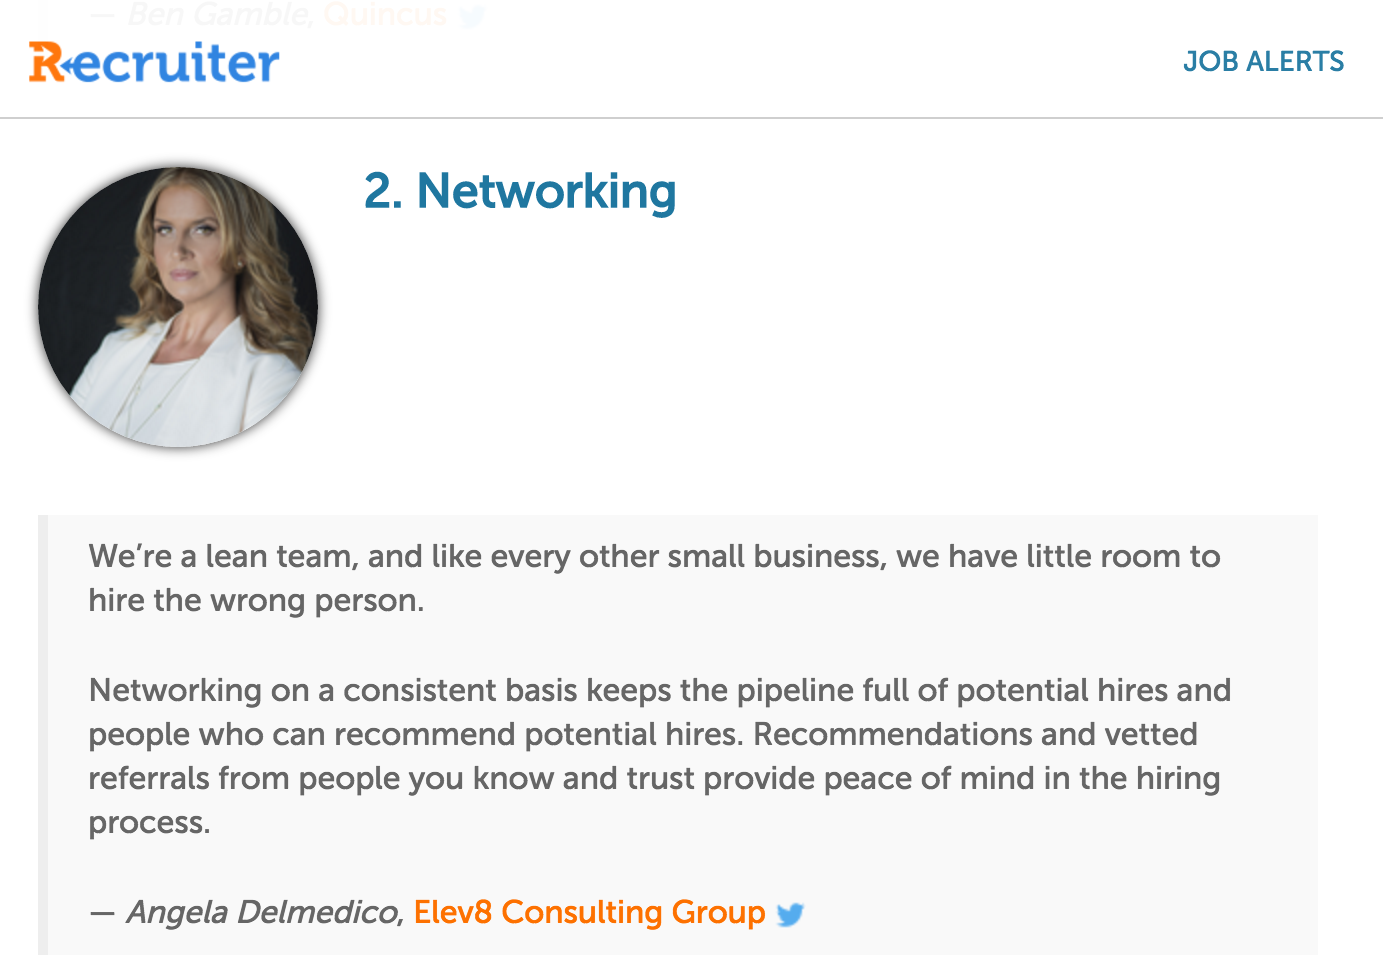 Angela Delmedico, Elev8 Consulting Group Recruiter